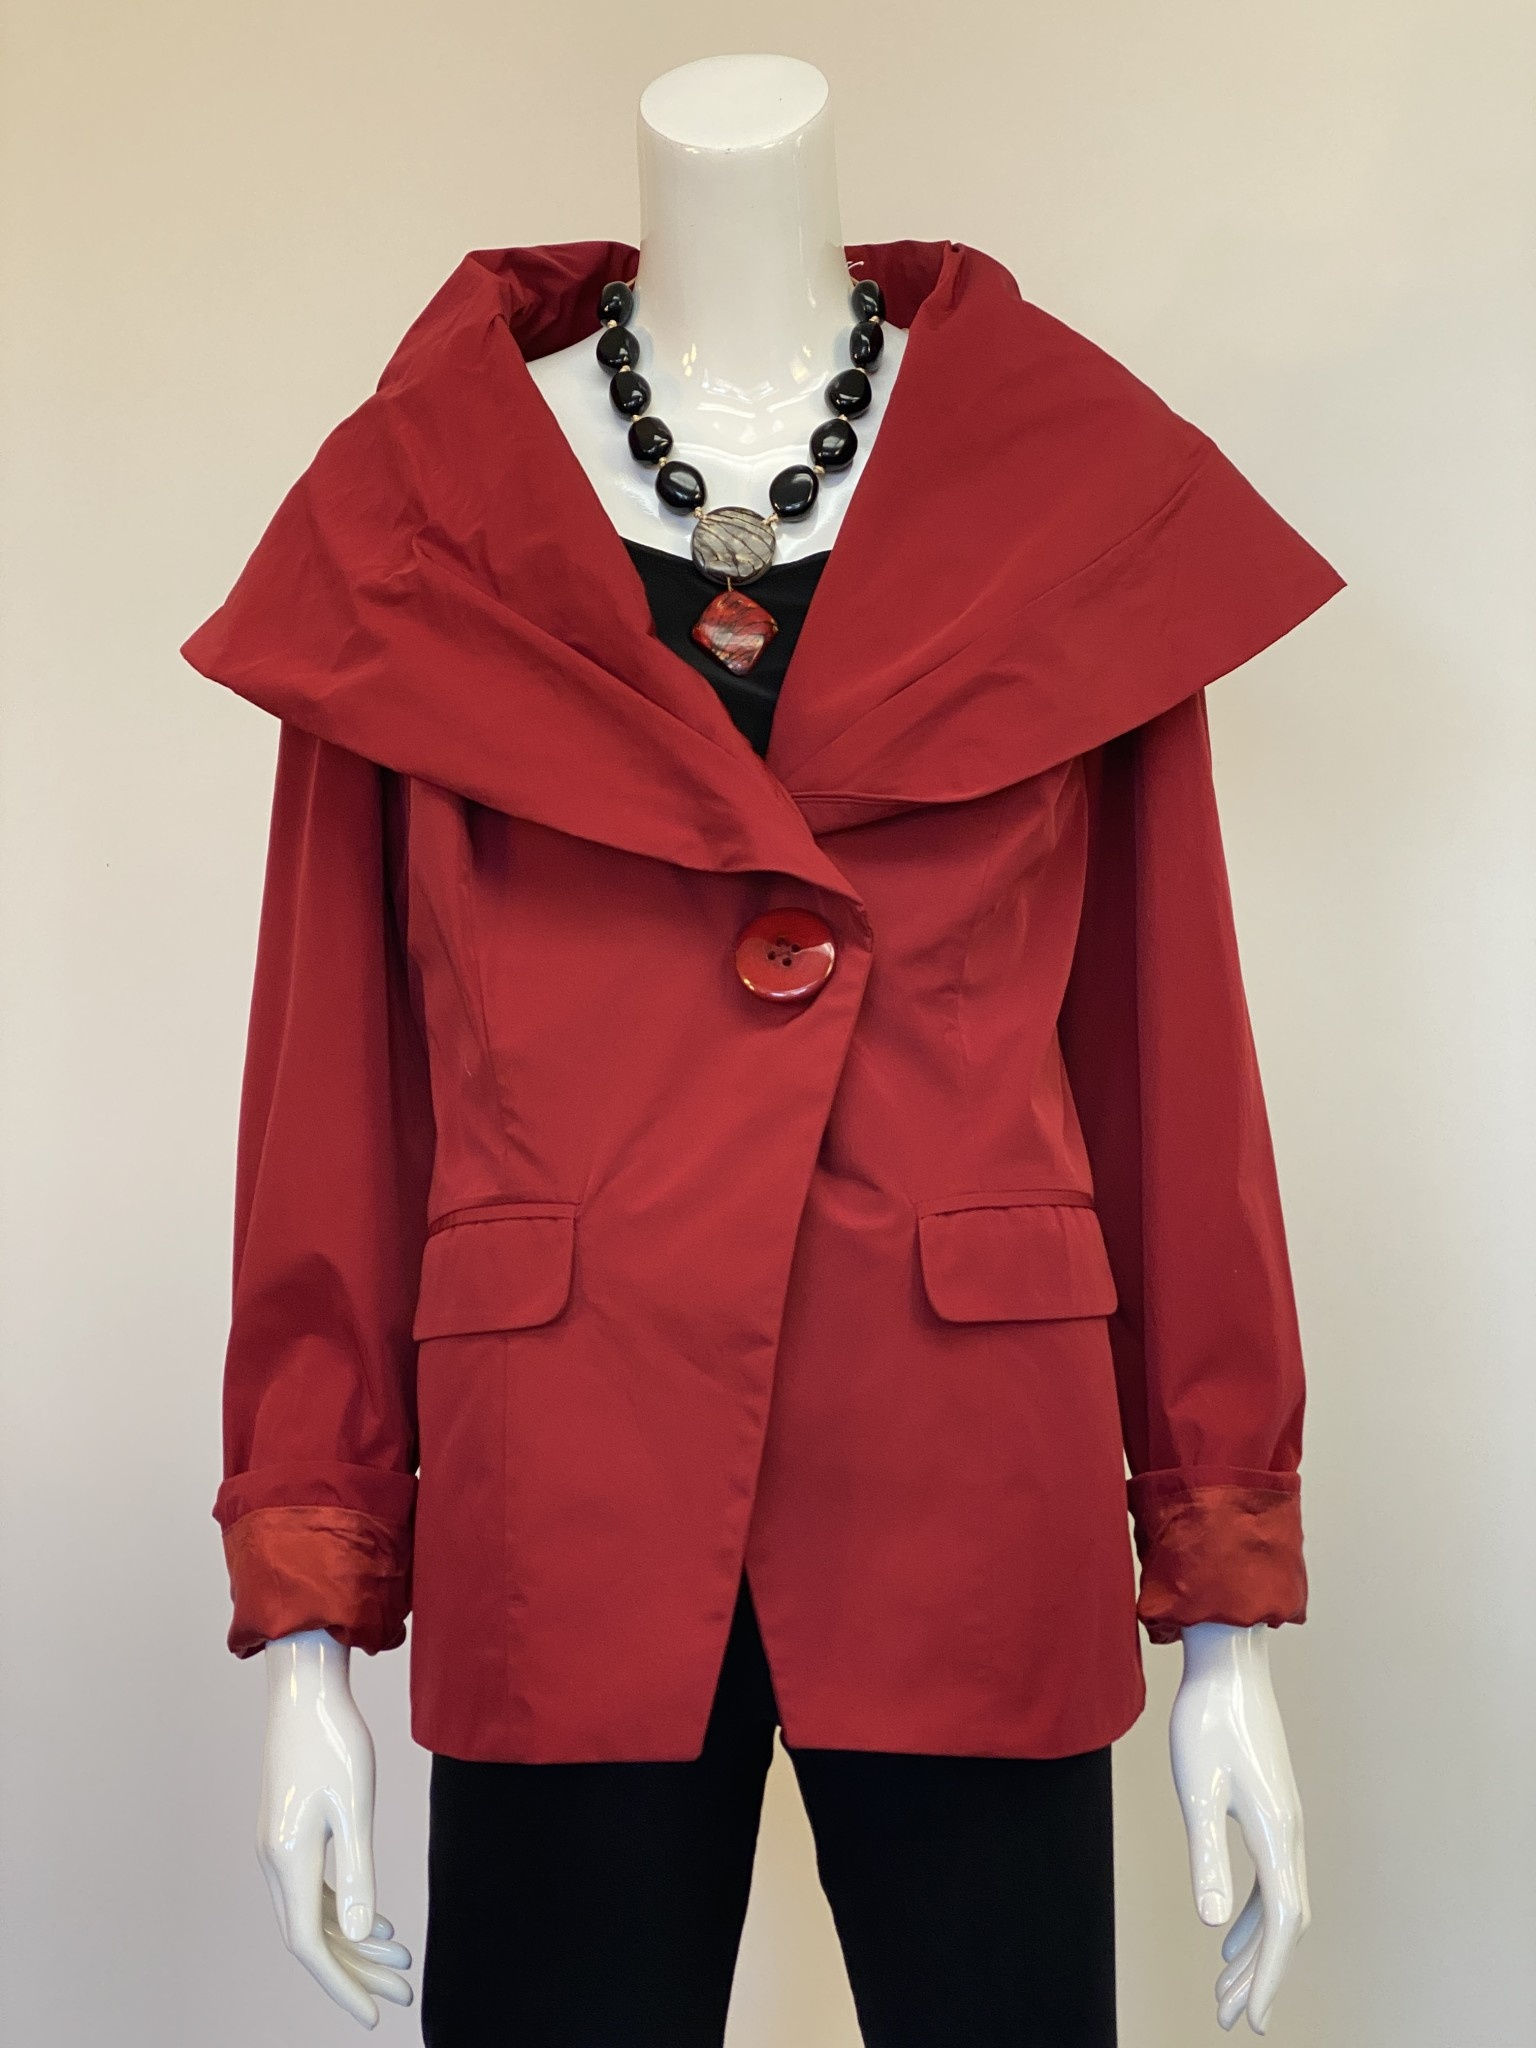 Design Today 3255 DESIGN TODAY POPLIN JKET RED XLG